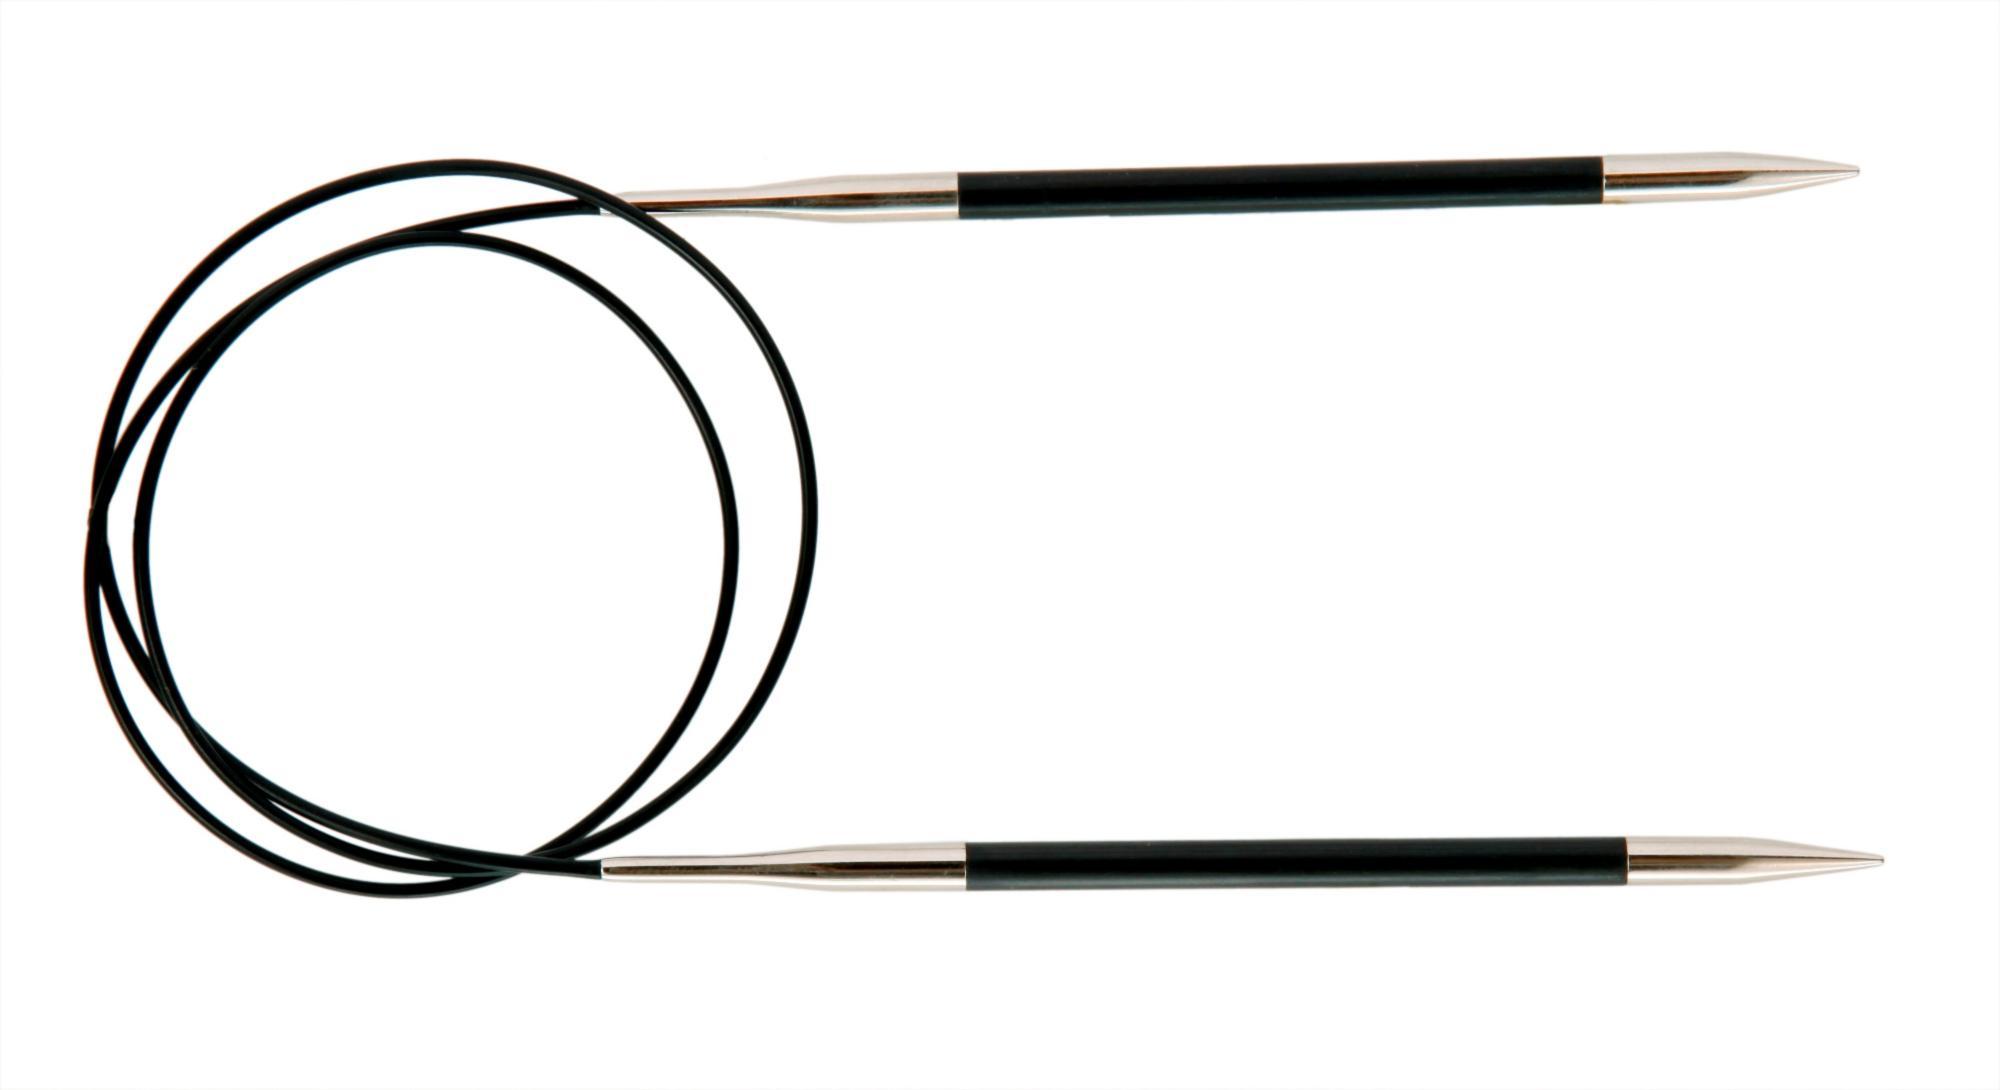 Спицы круговые 80 см Karbonz KnitPro, 41188, 4.00 мм